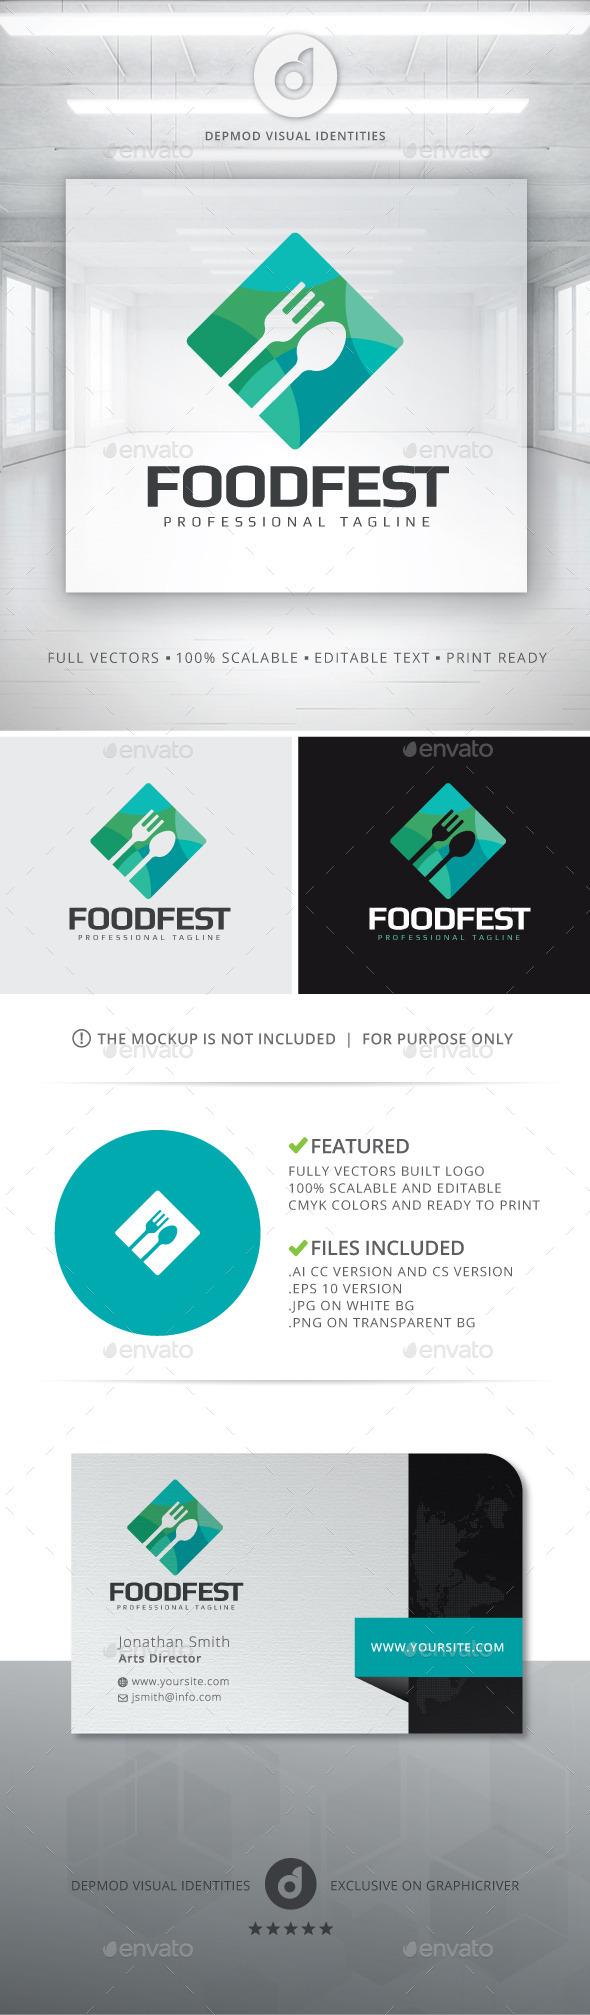 Food Fest Logo